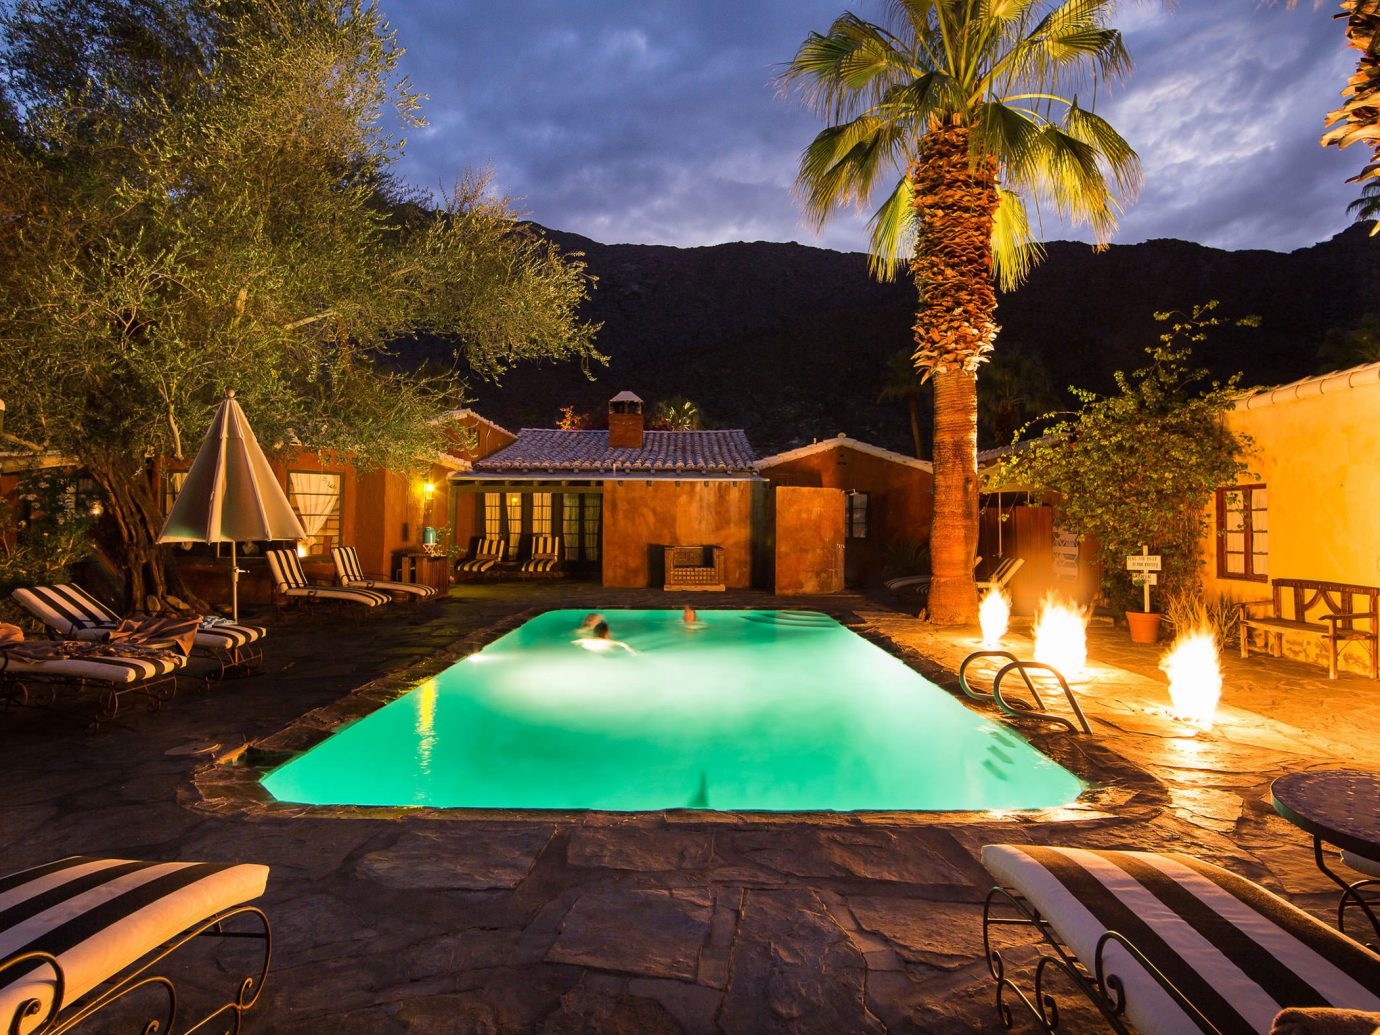 Trip Ideas tree outdoor leisure swimming pool estate Resort landscape lighting mansion Villa screenshot backyard area several